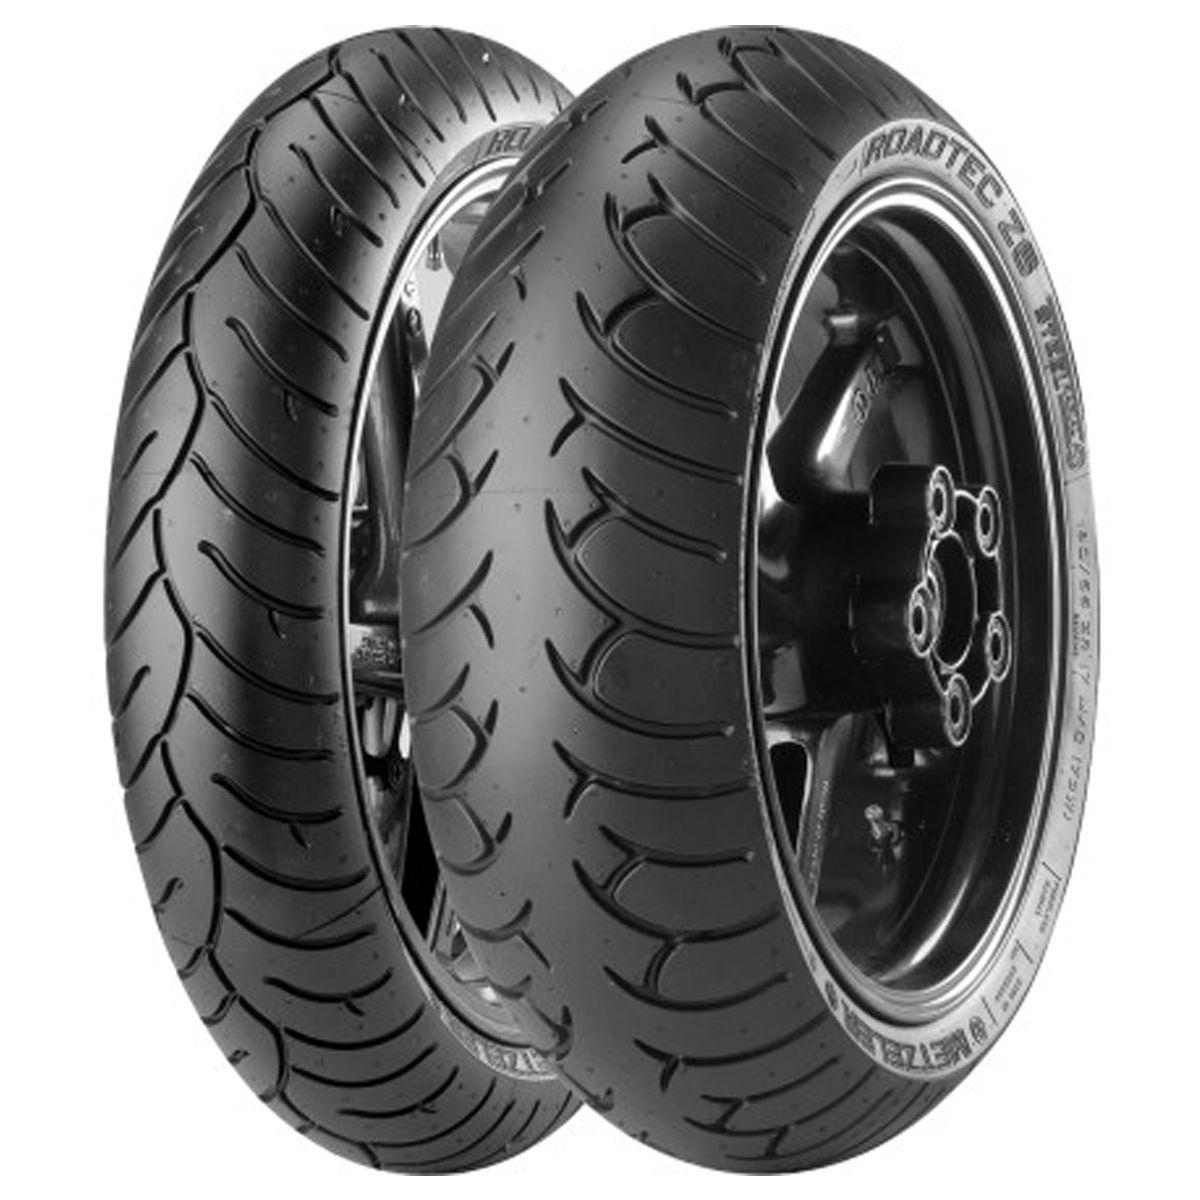 Metzeler Roadtec Z6 Interact Tire Review